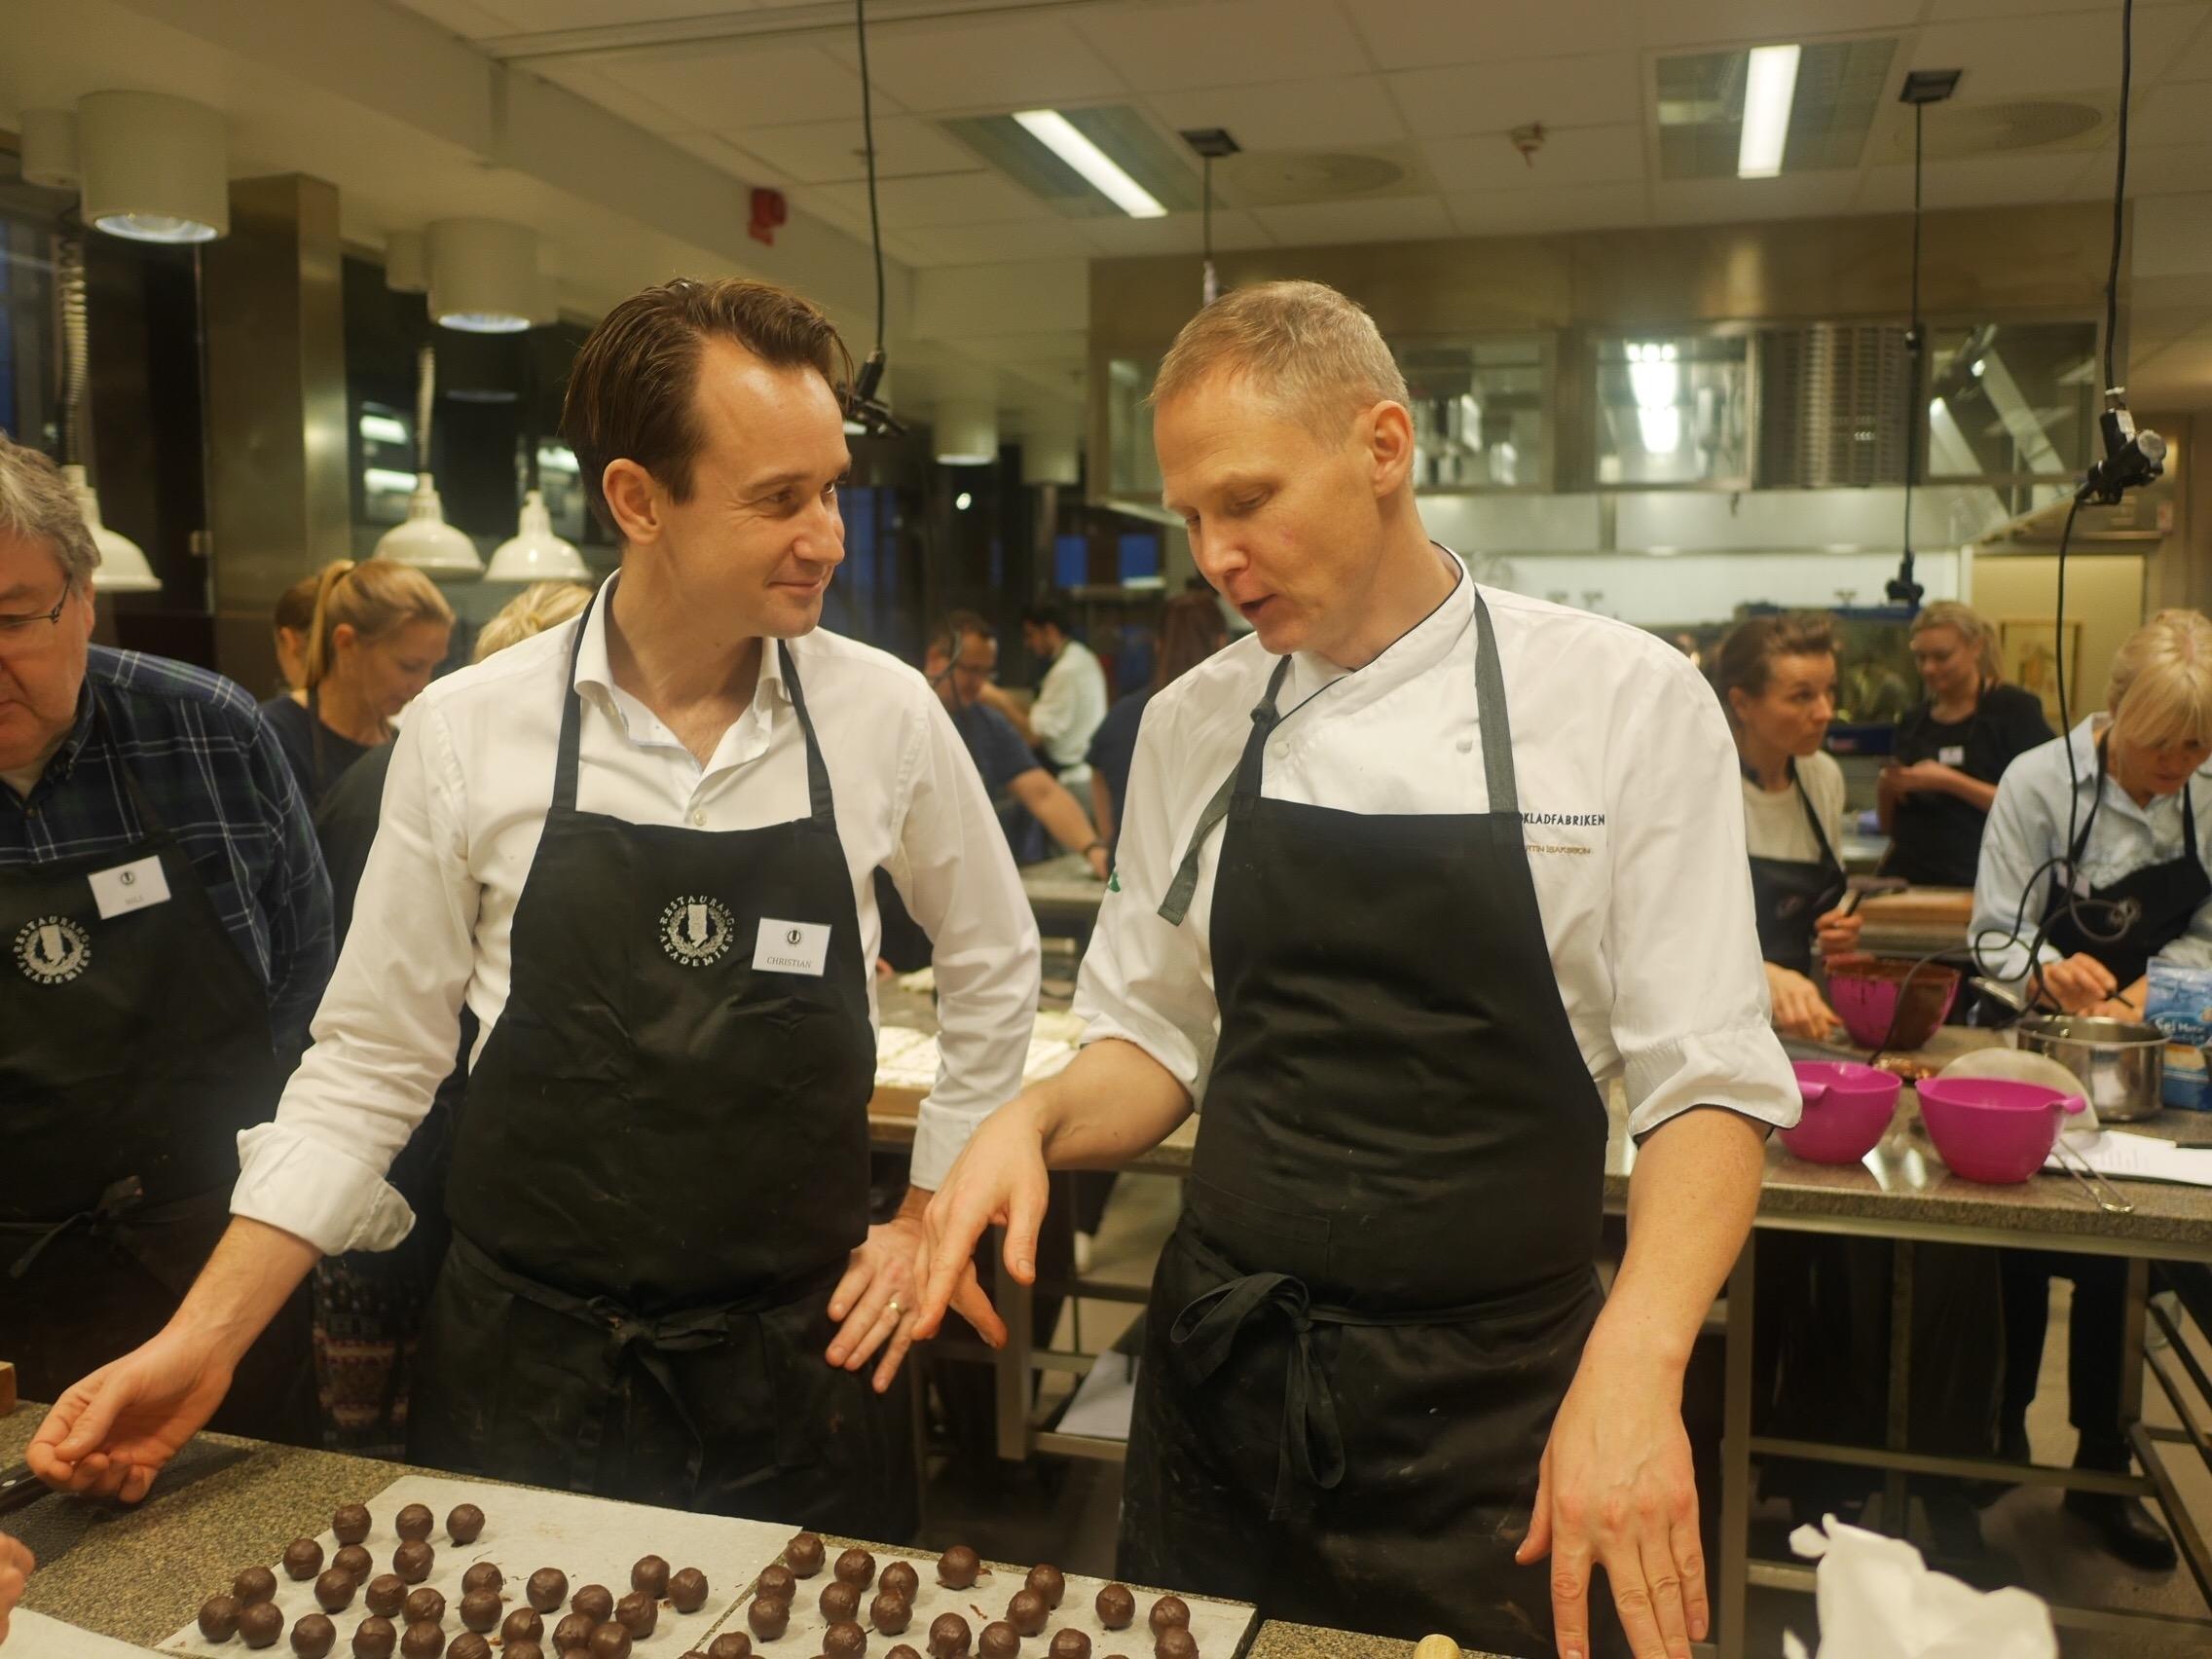 Matlagningskurser i Stockholm